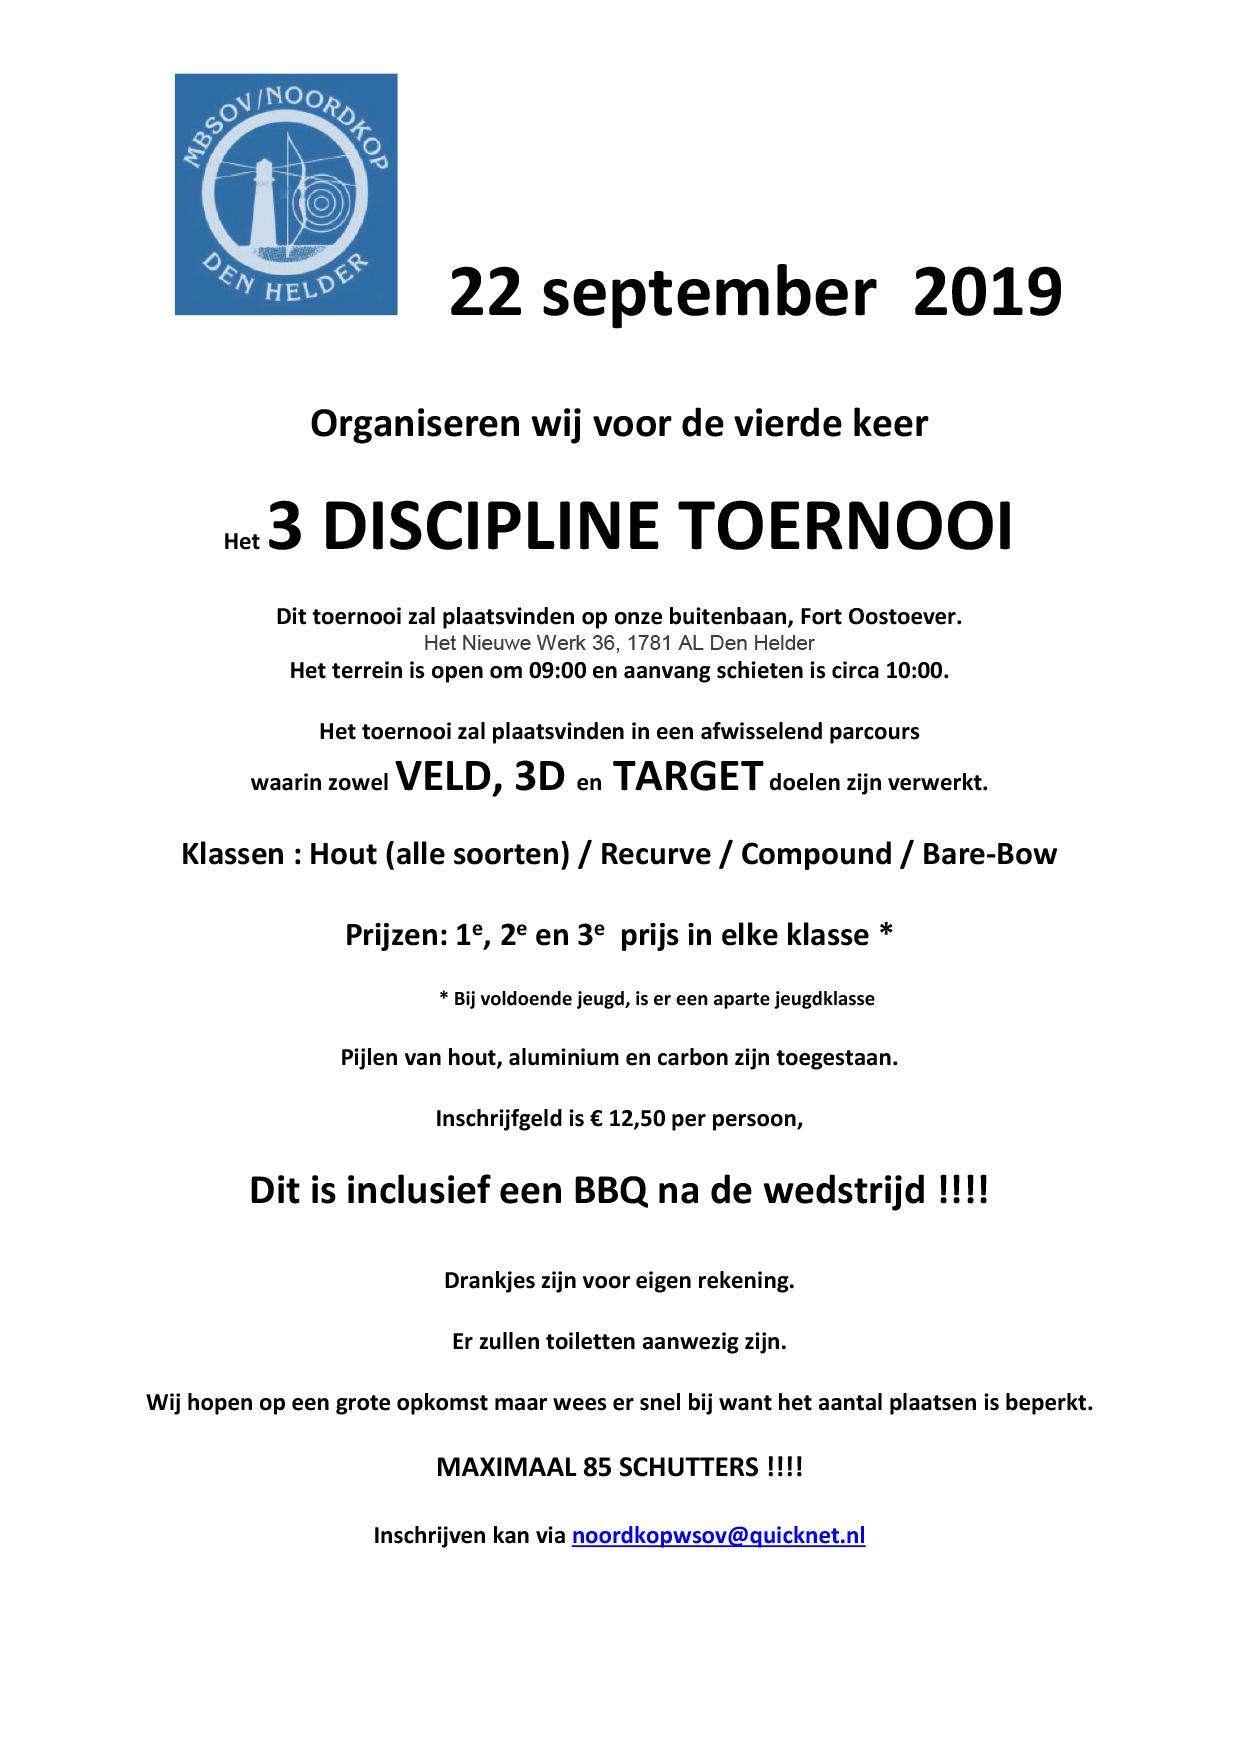 Het 3 Discipline Toernooi MBSOV Noordkop @ Buitenbaan, Fort Oostoever